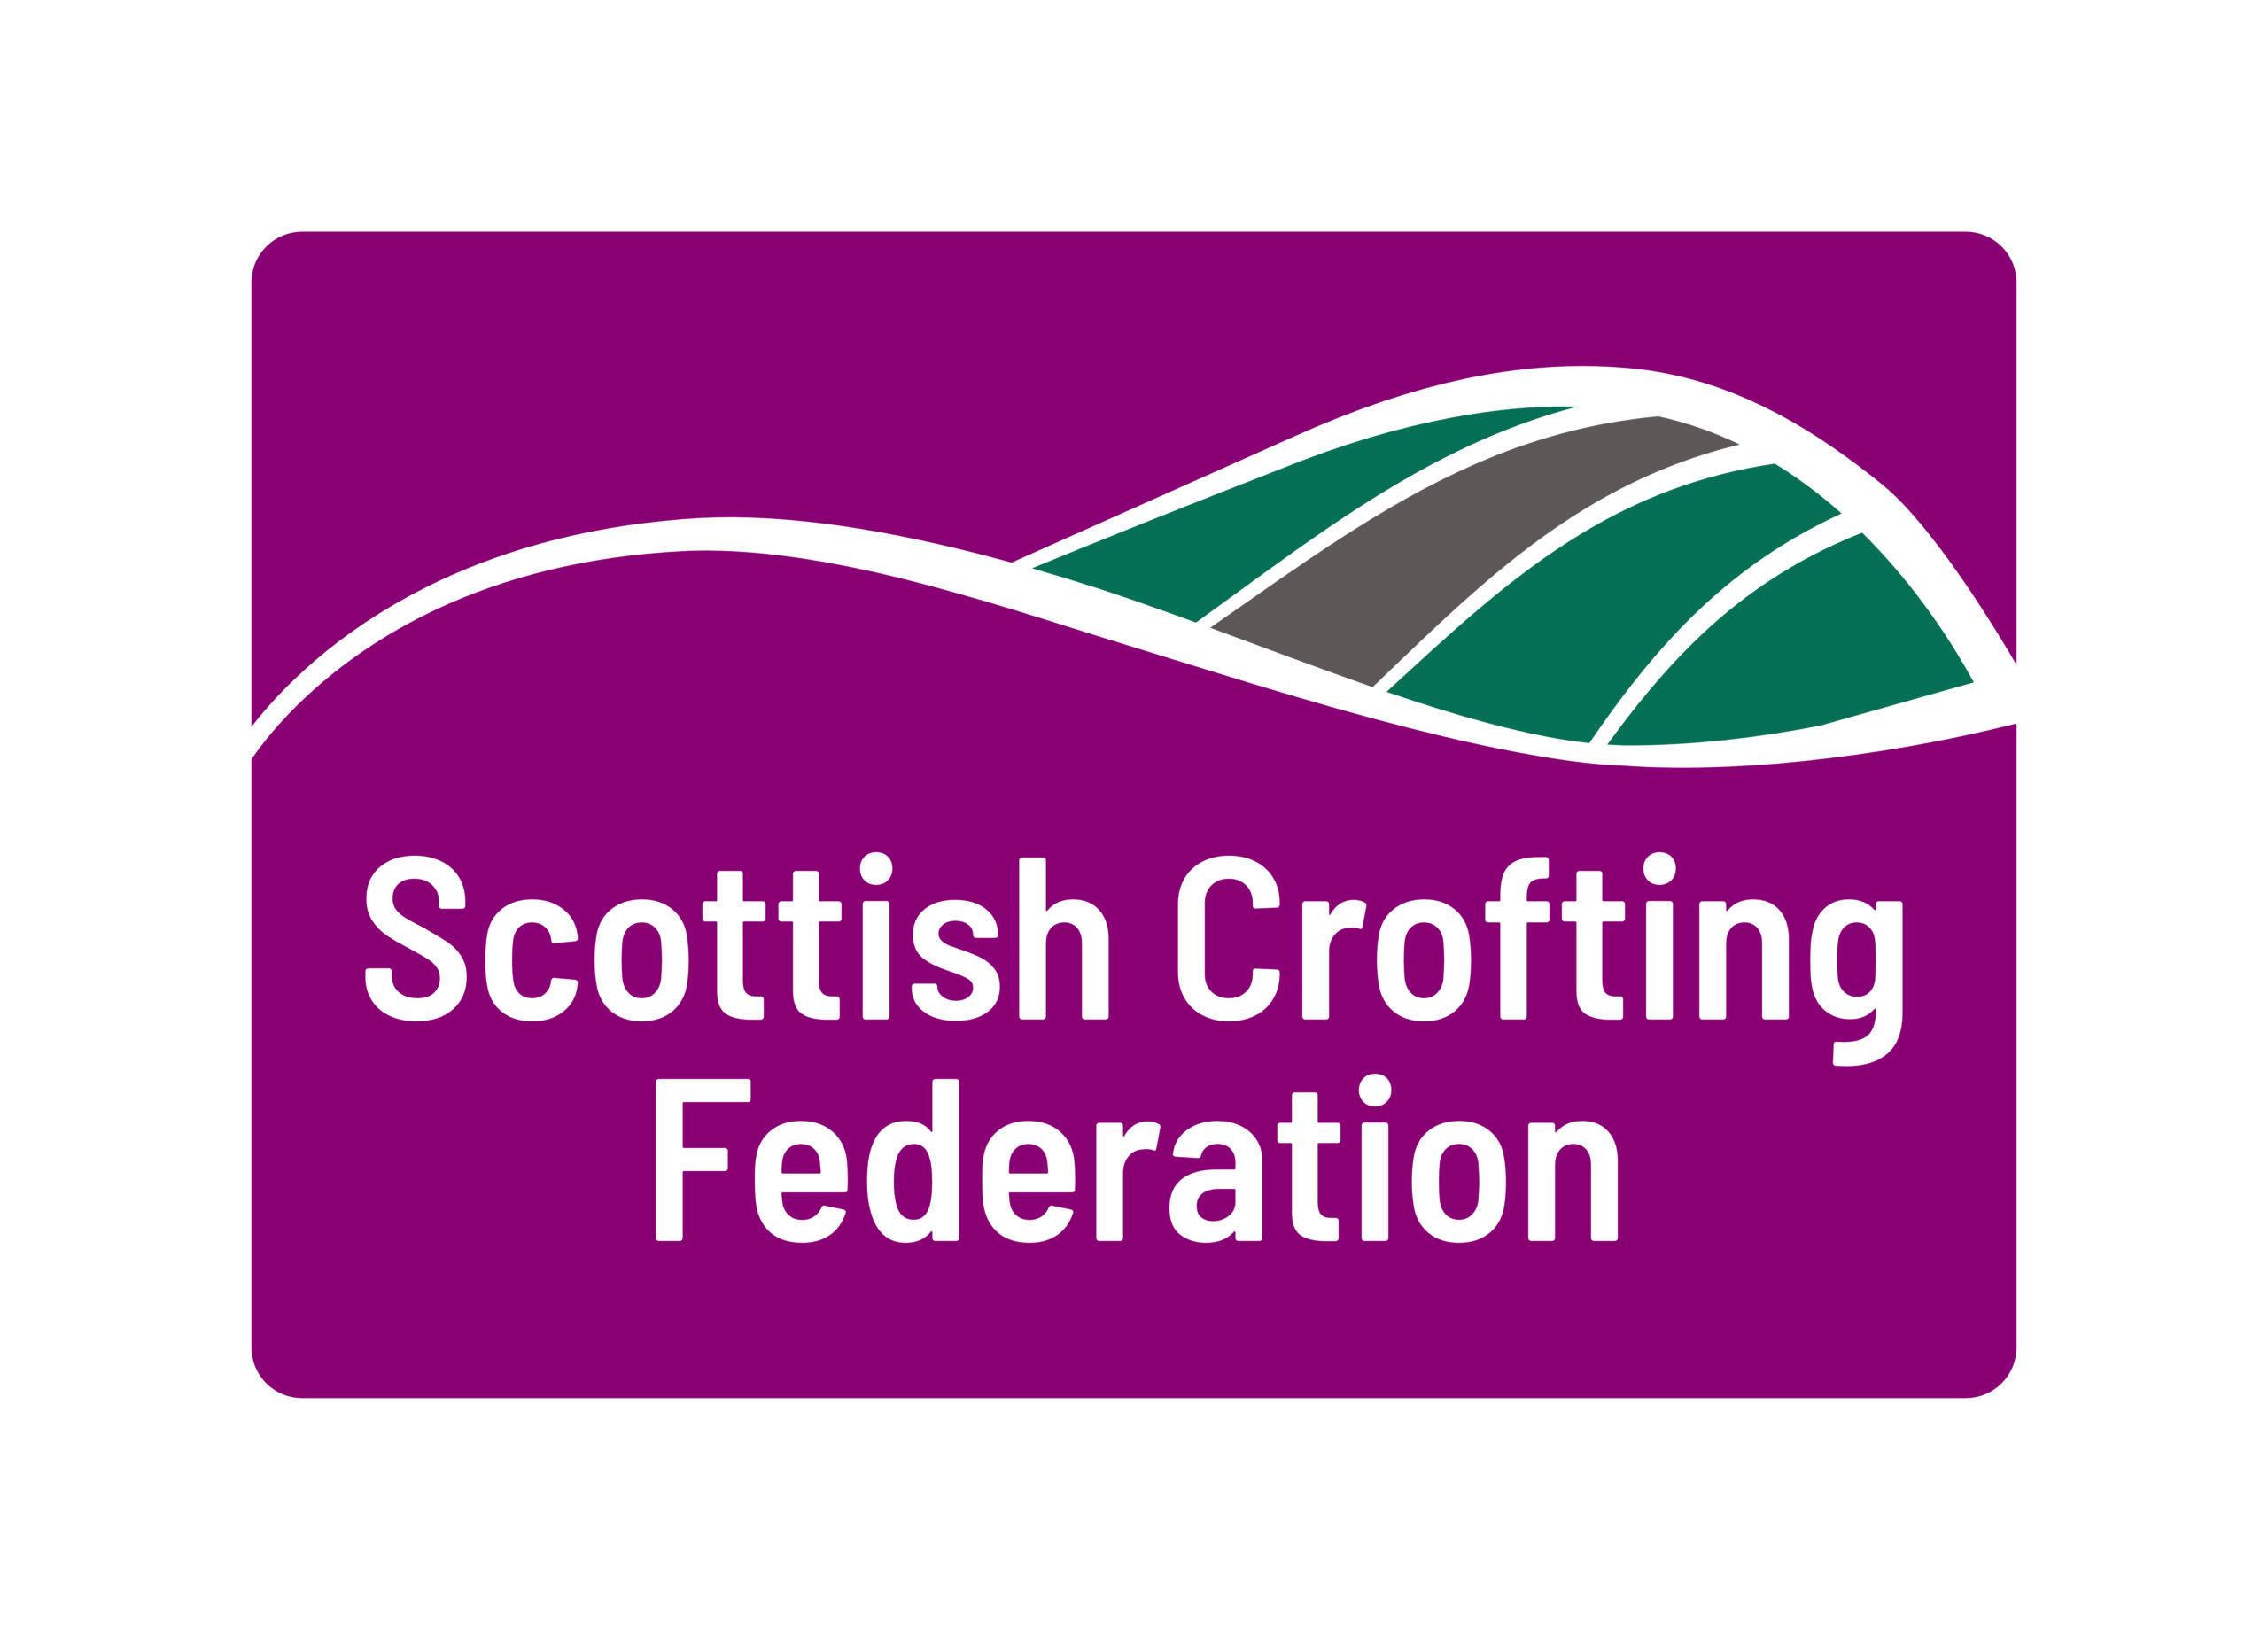 Scottish Crofting Federation